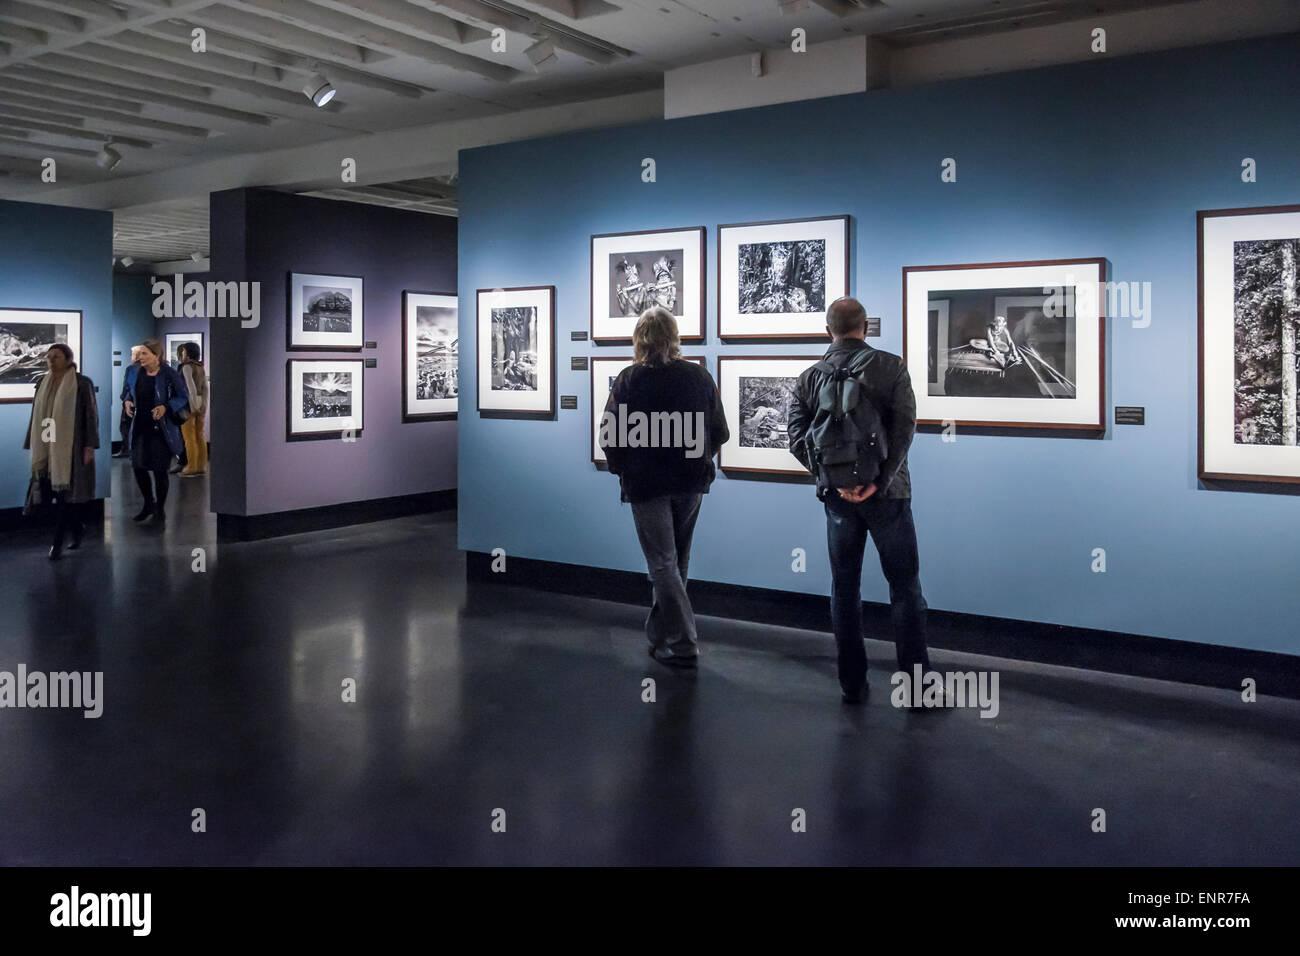 C/o Berlin Galerie Interieur und Menschen Fotograf Sebastiao Salgado 'Genesis' Ausstellung Amerika Haus, Stockbild